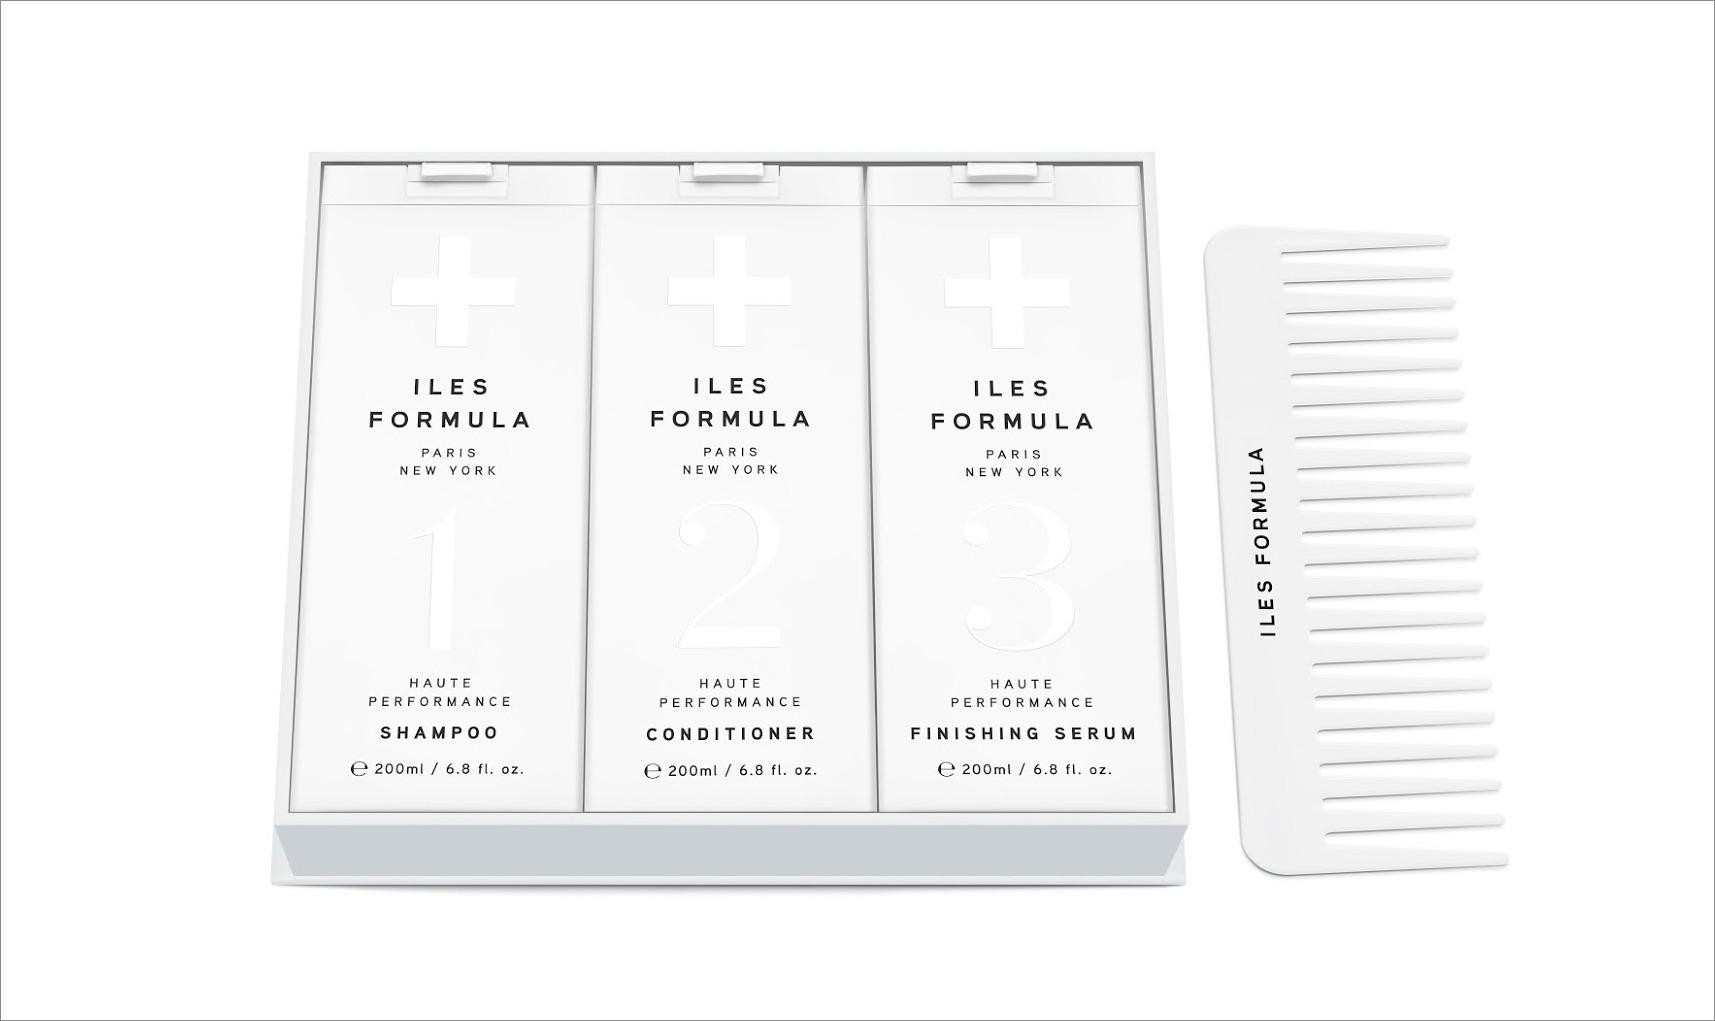 Iles Paris gift box with shampoo conditioner finishing serum and comb